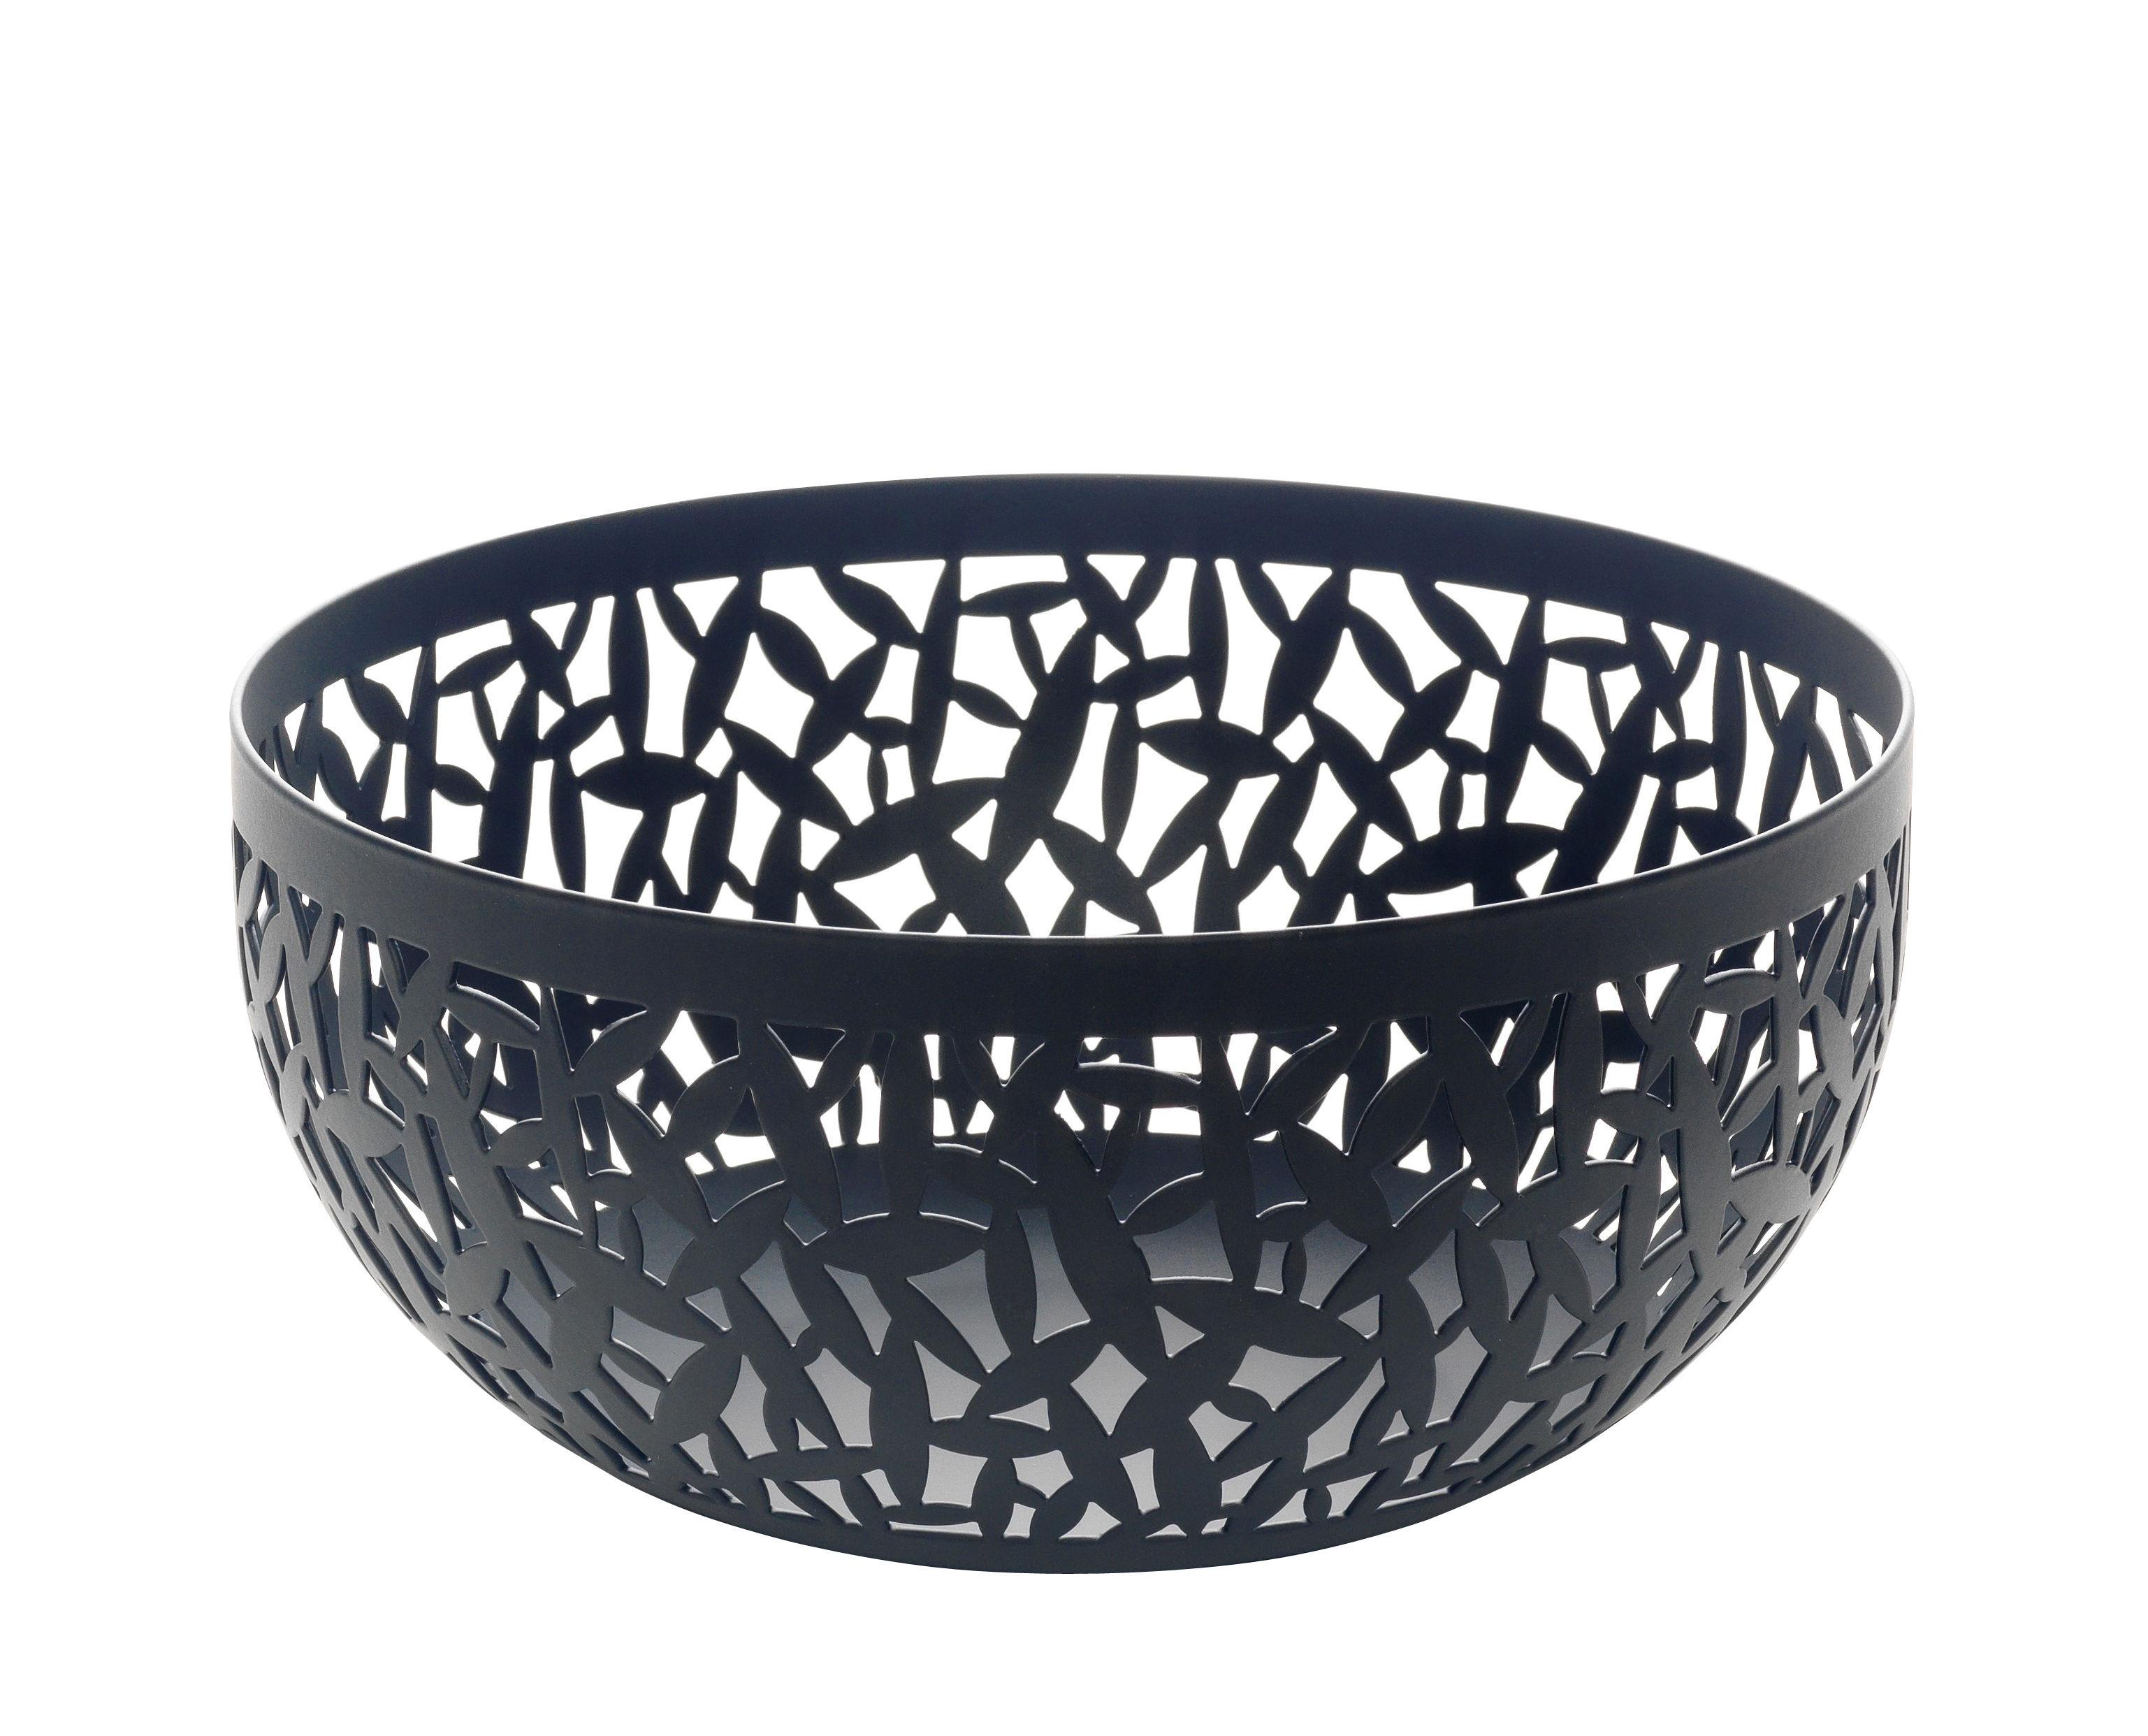 Tableware - Fruit Bowls & Centrepieces - Cactus! Basket - Ø 21 cm by Alessi - Ø 21 cm - Black - Stainless steel epoxy coloration resin